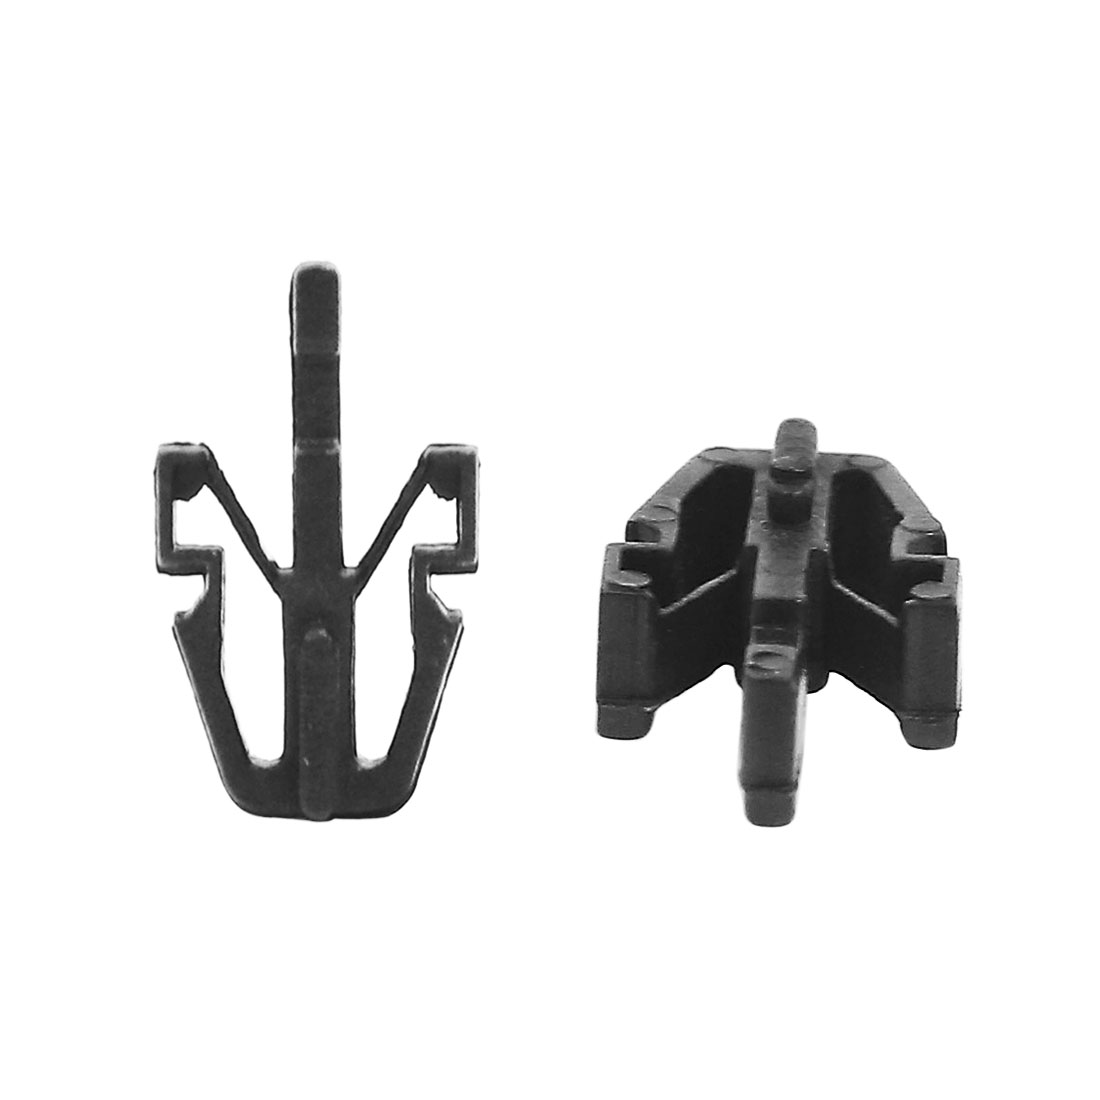 50 Pcs Universal Black Plastic Rivet Push in Type Retainer Fastener Clips 11mm